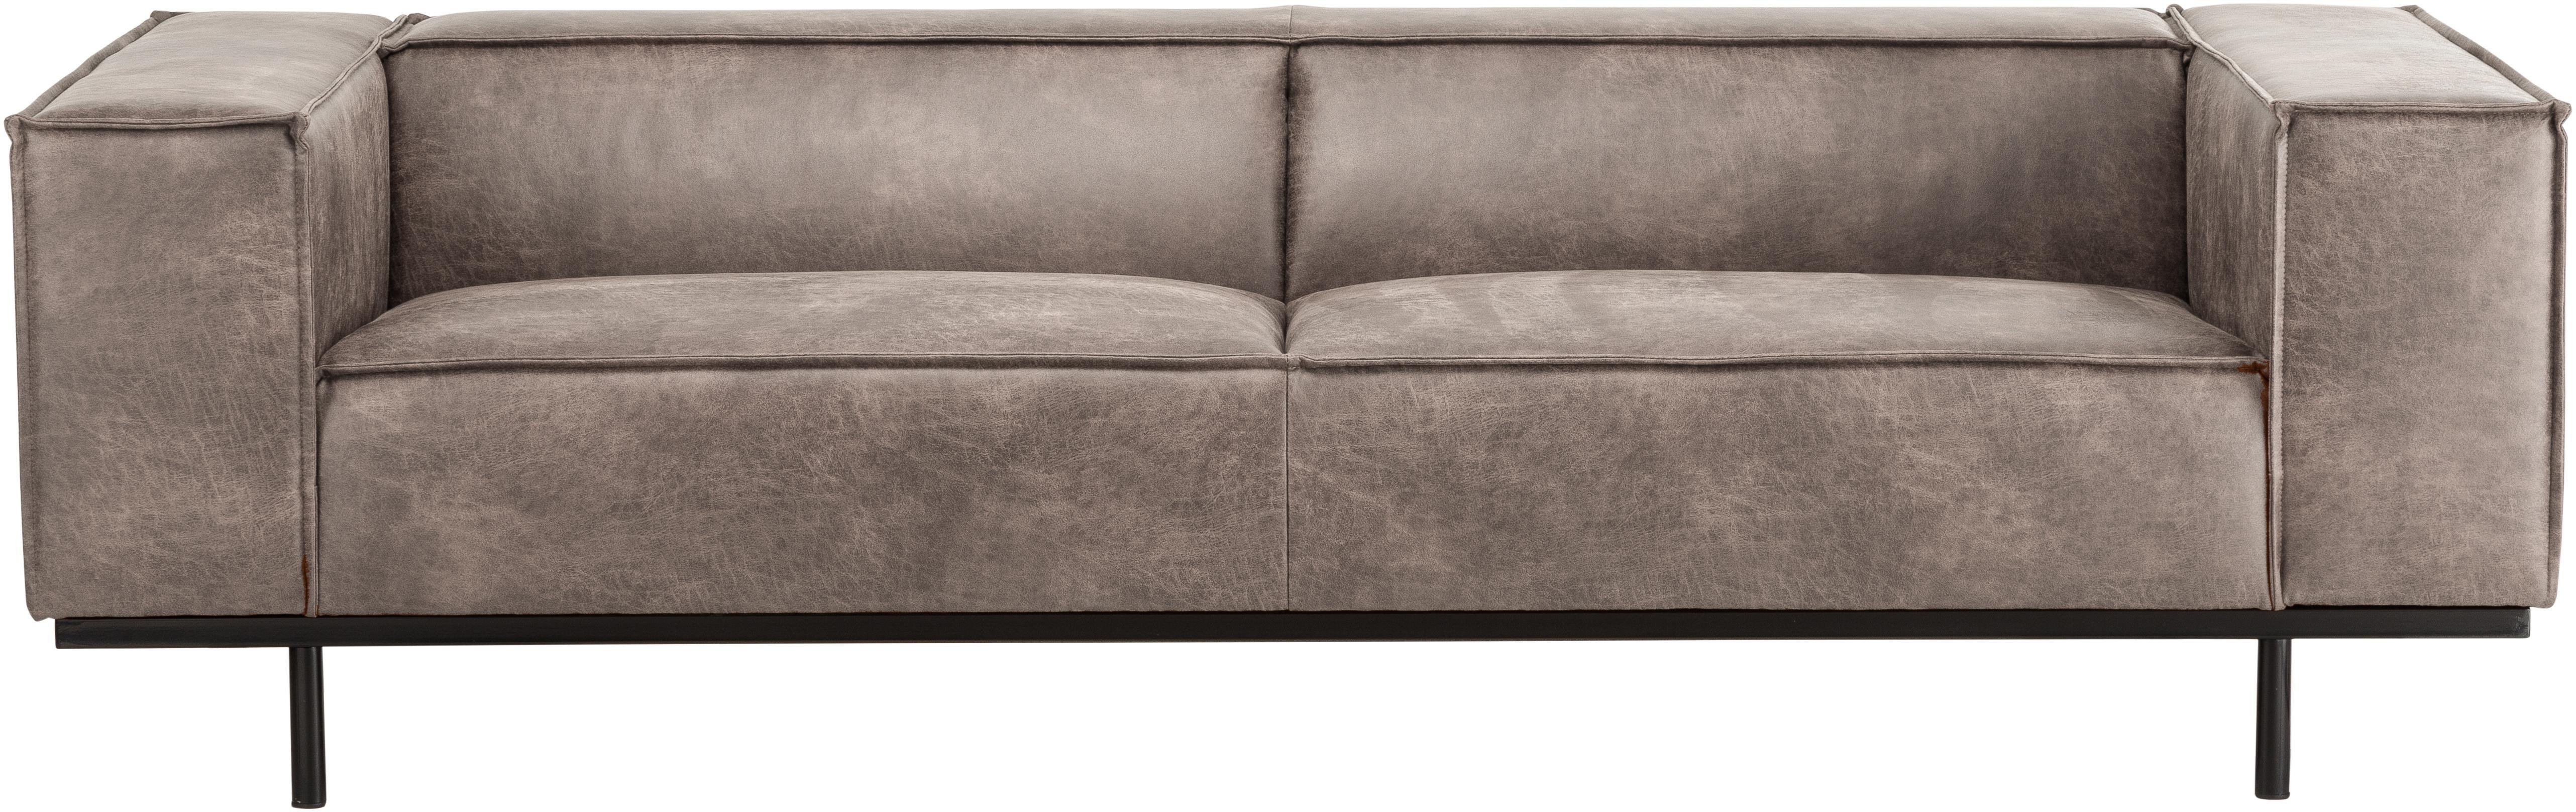 Sofá Abigail (2plazas), Tapizado: fibra de cuero (70%cuero, Patas: acero, pintado, Color coñac, An 190 x F 95 cm